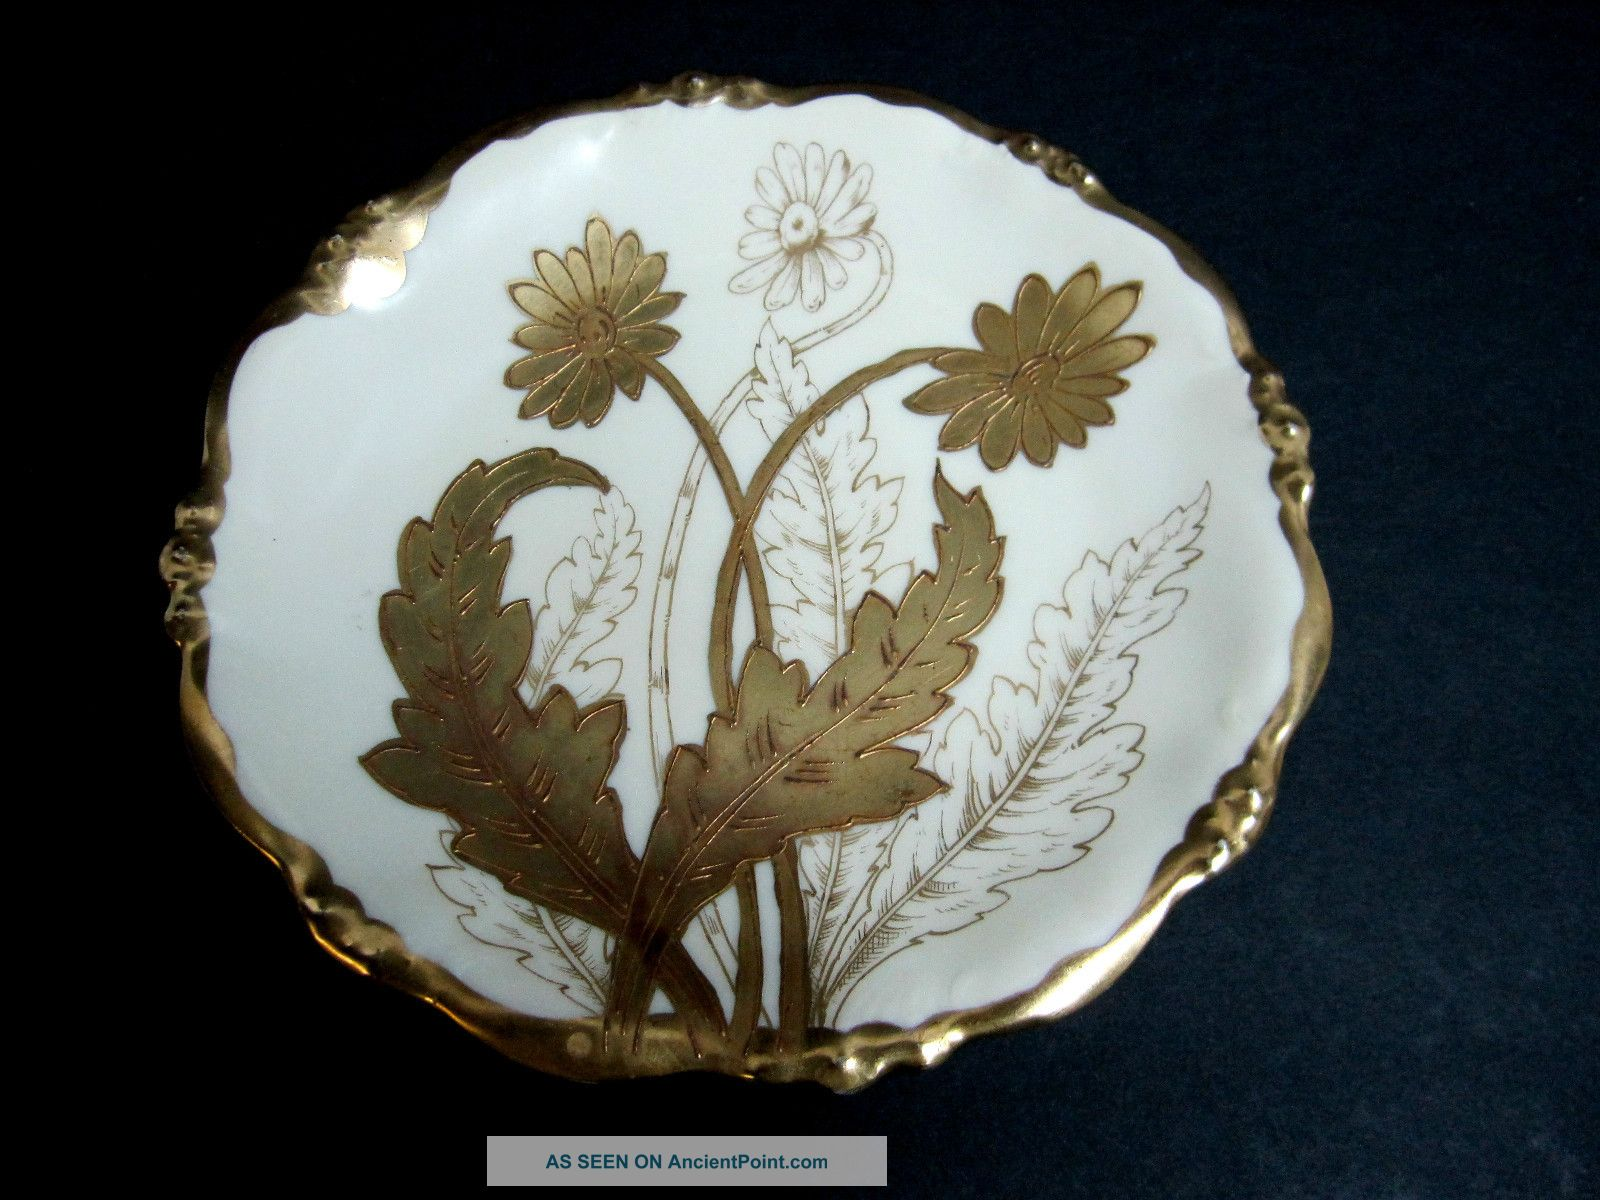 Antique Victorian Elite Works Bawo Dotter Limoges Gold Gild Floral Display Plate Victorian photo